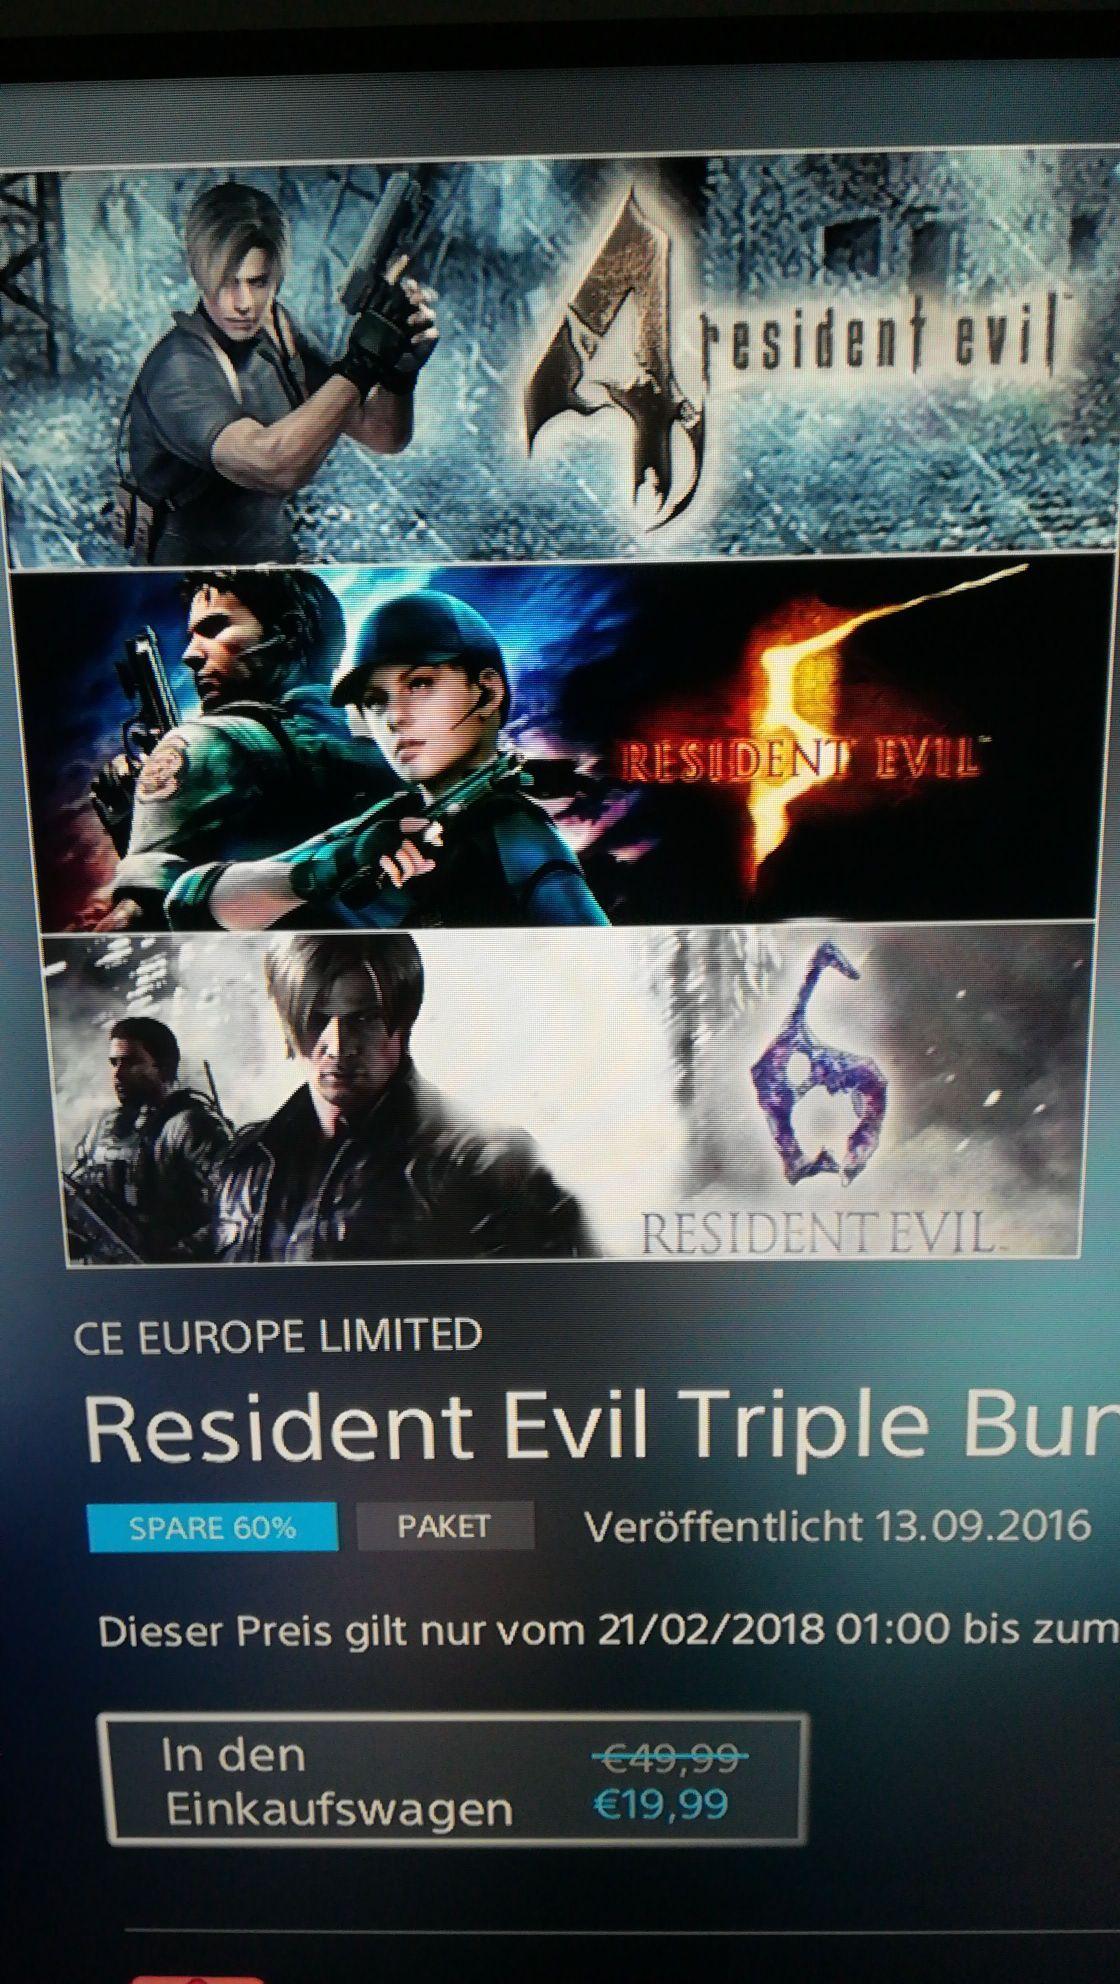 Resident evil Bundle ps4/psn